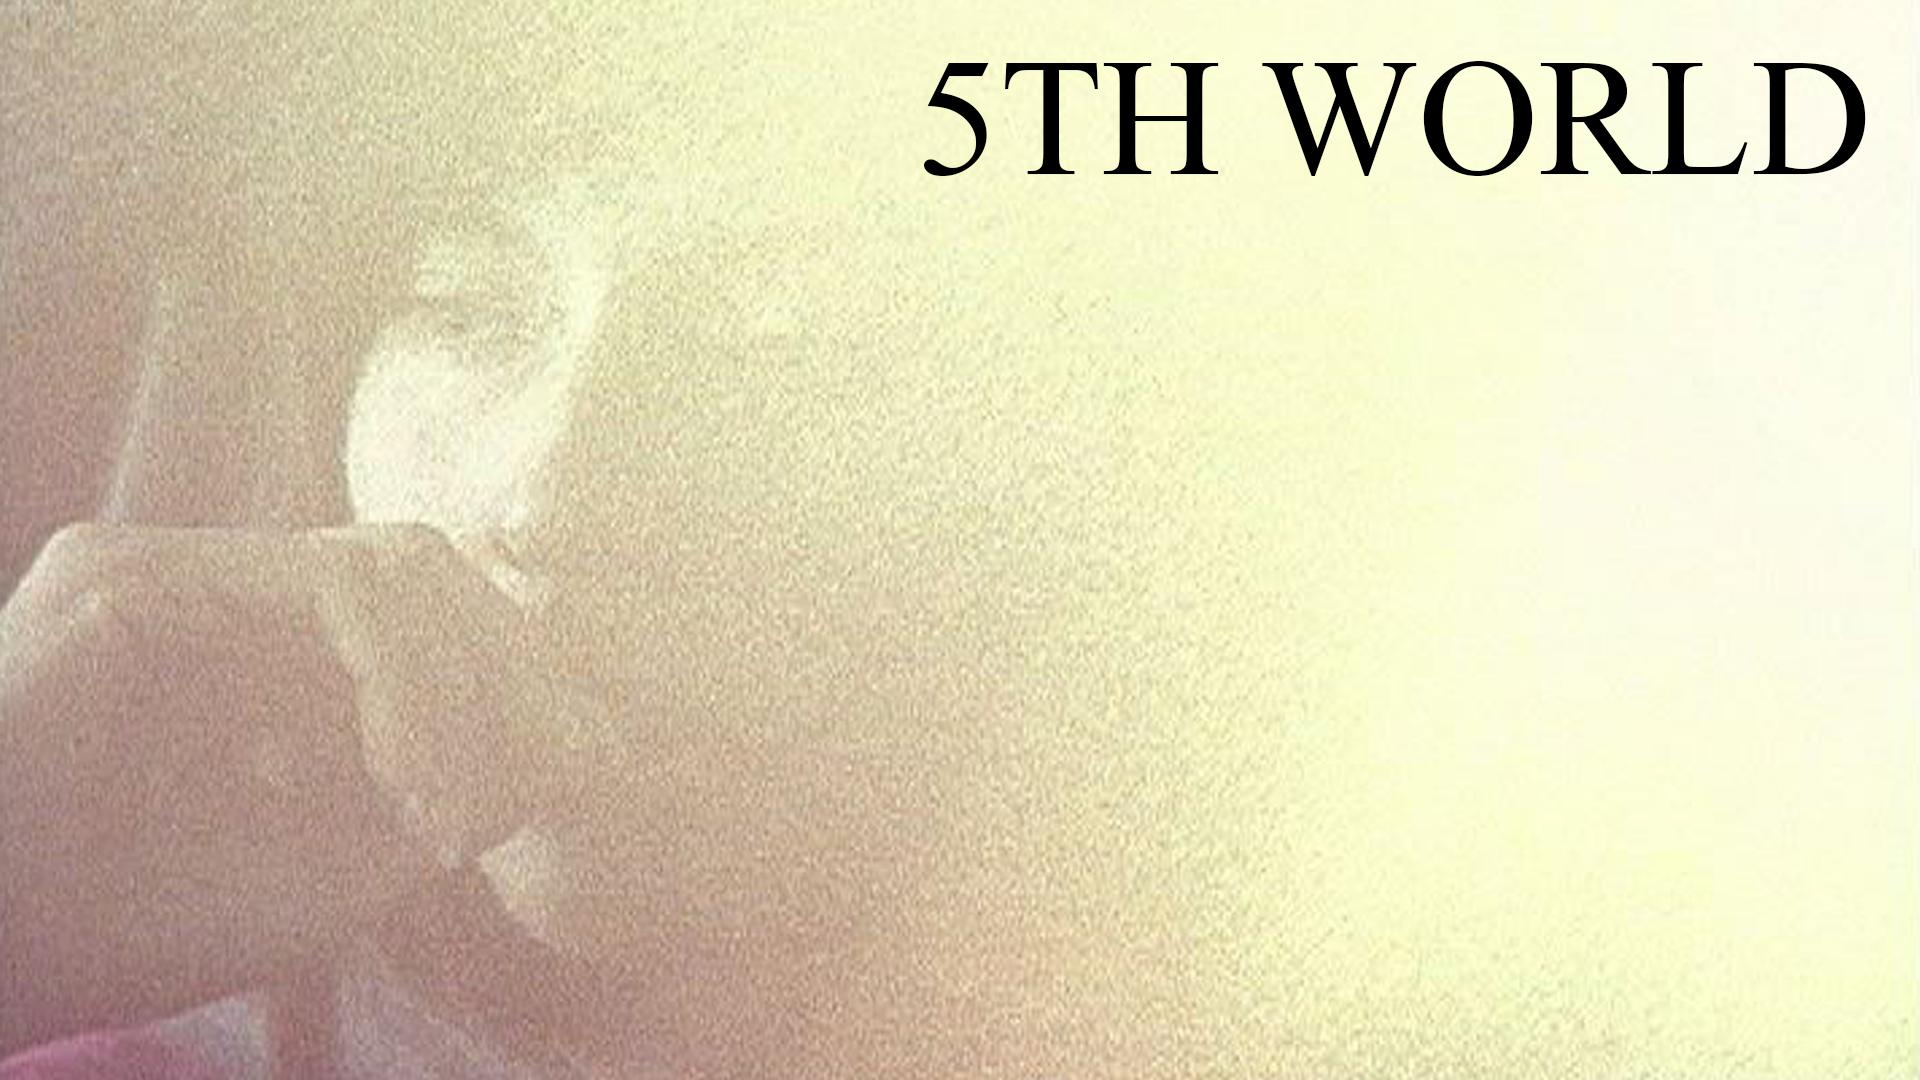 5TH WORLD